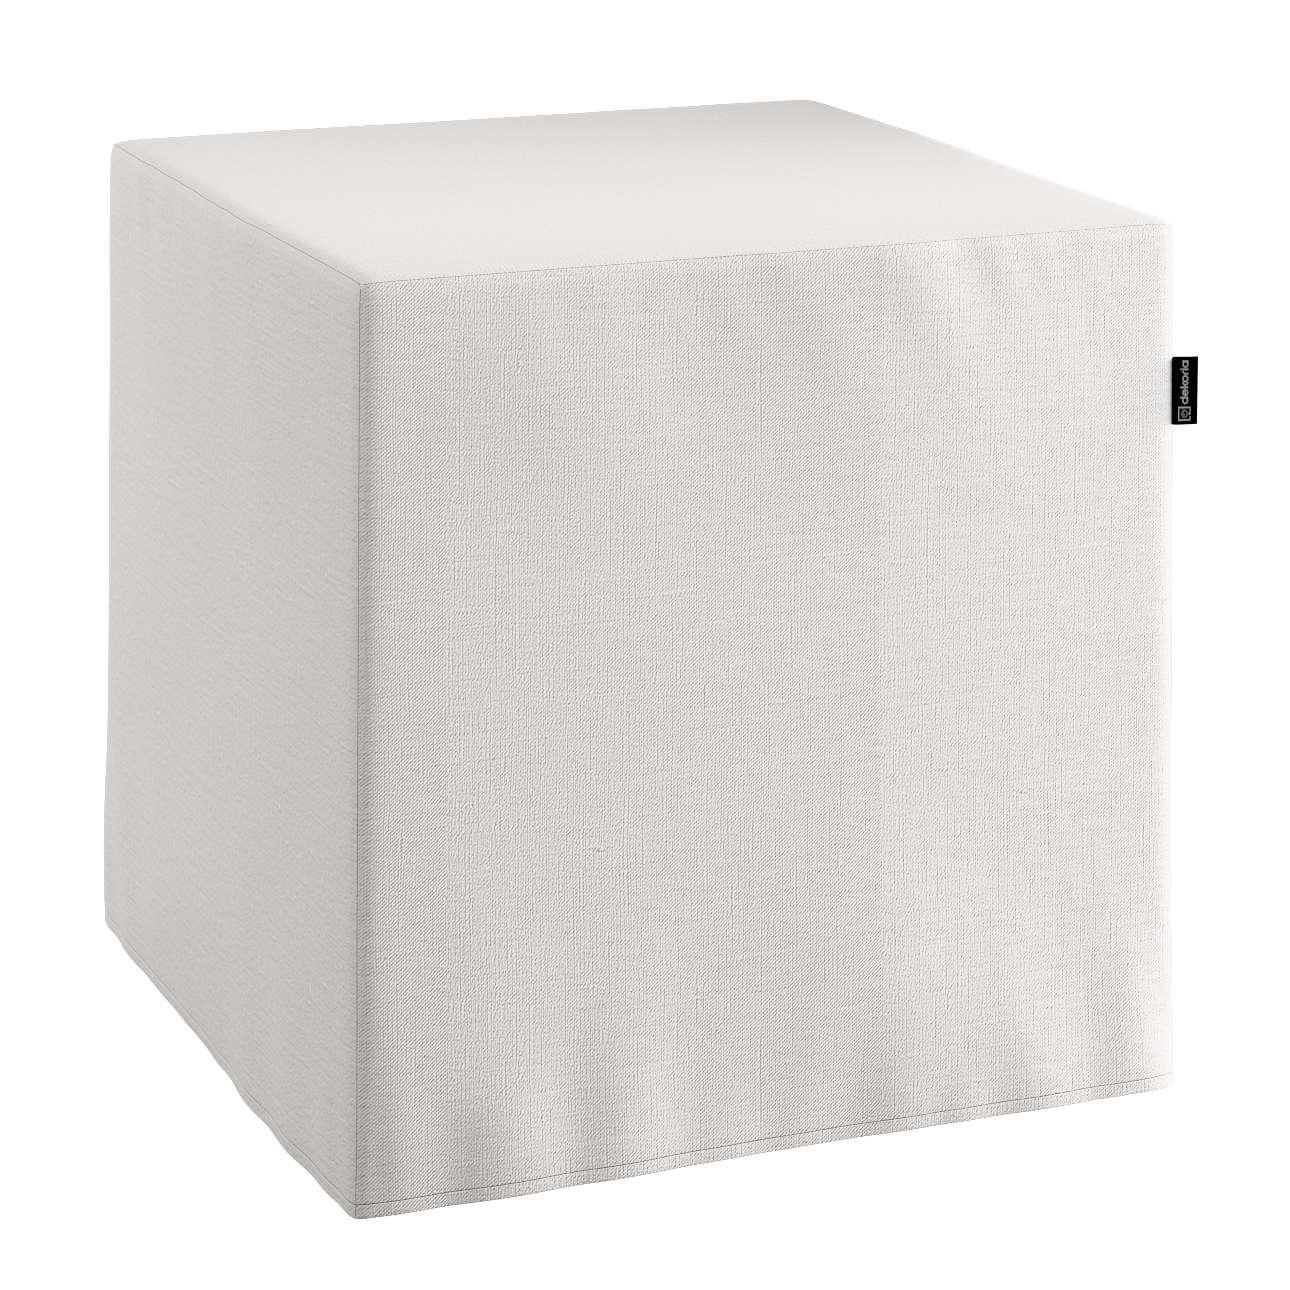 Pufas 40 x 40 x 40 cm kolekcijoje Linen , audinys: 392-04